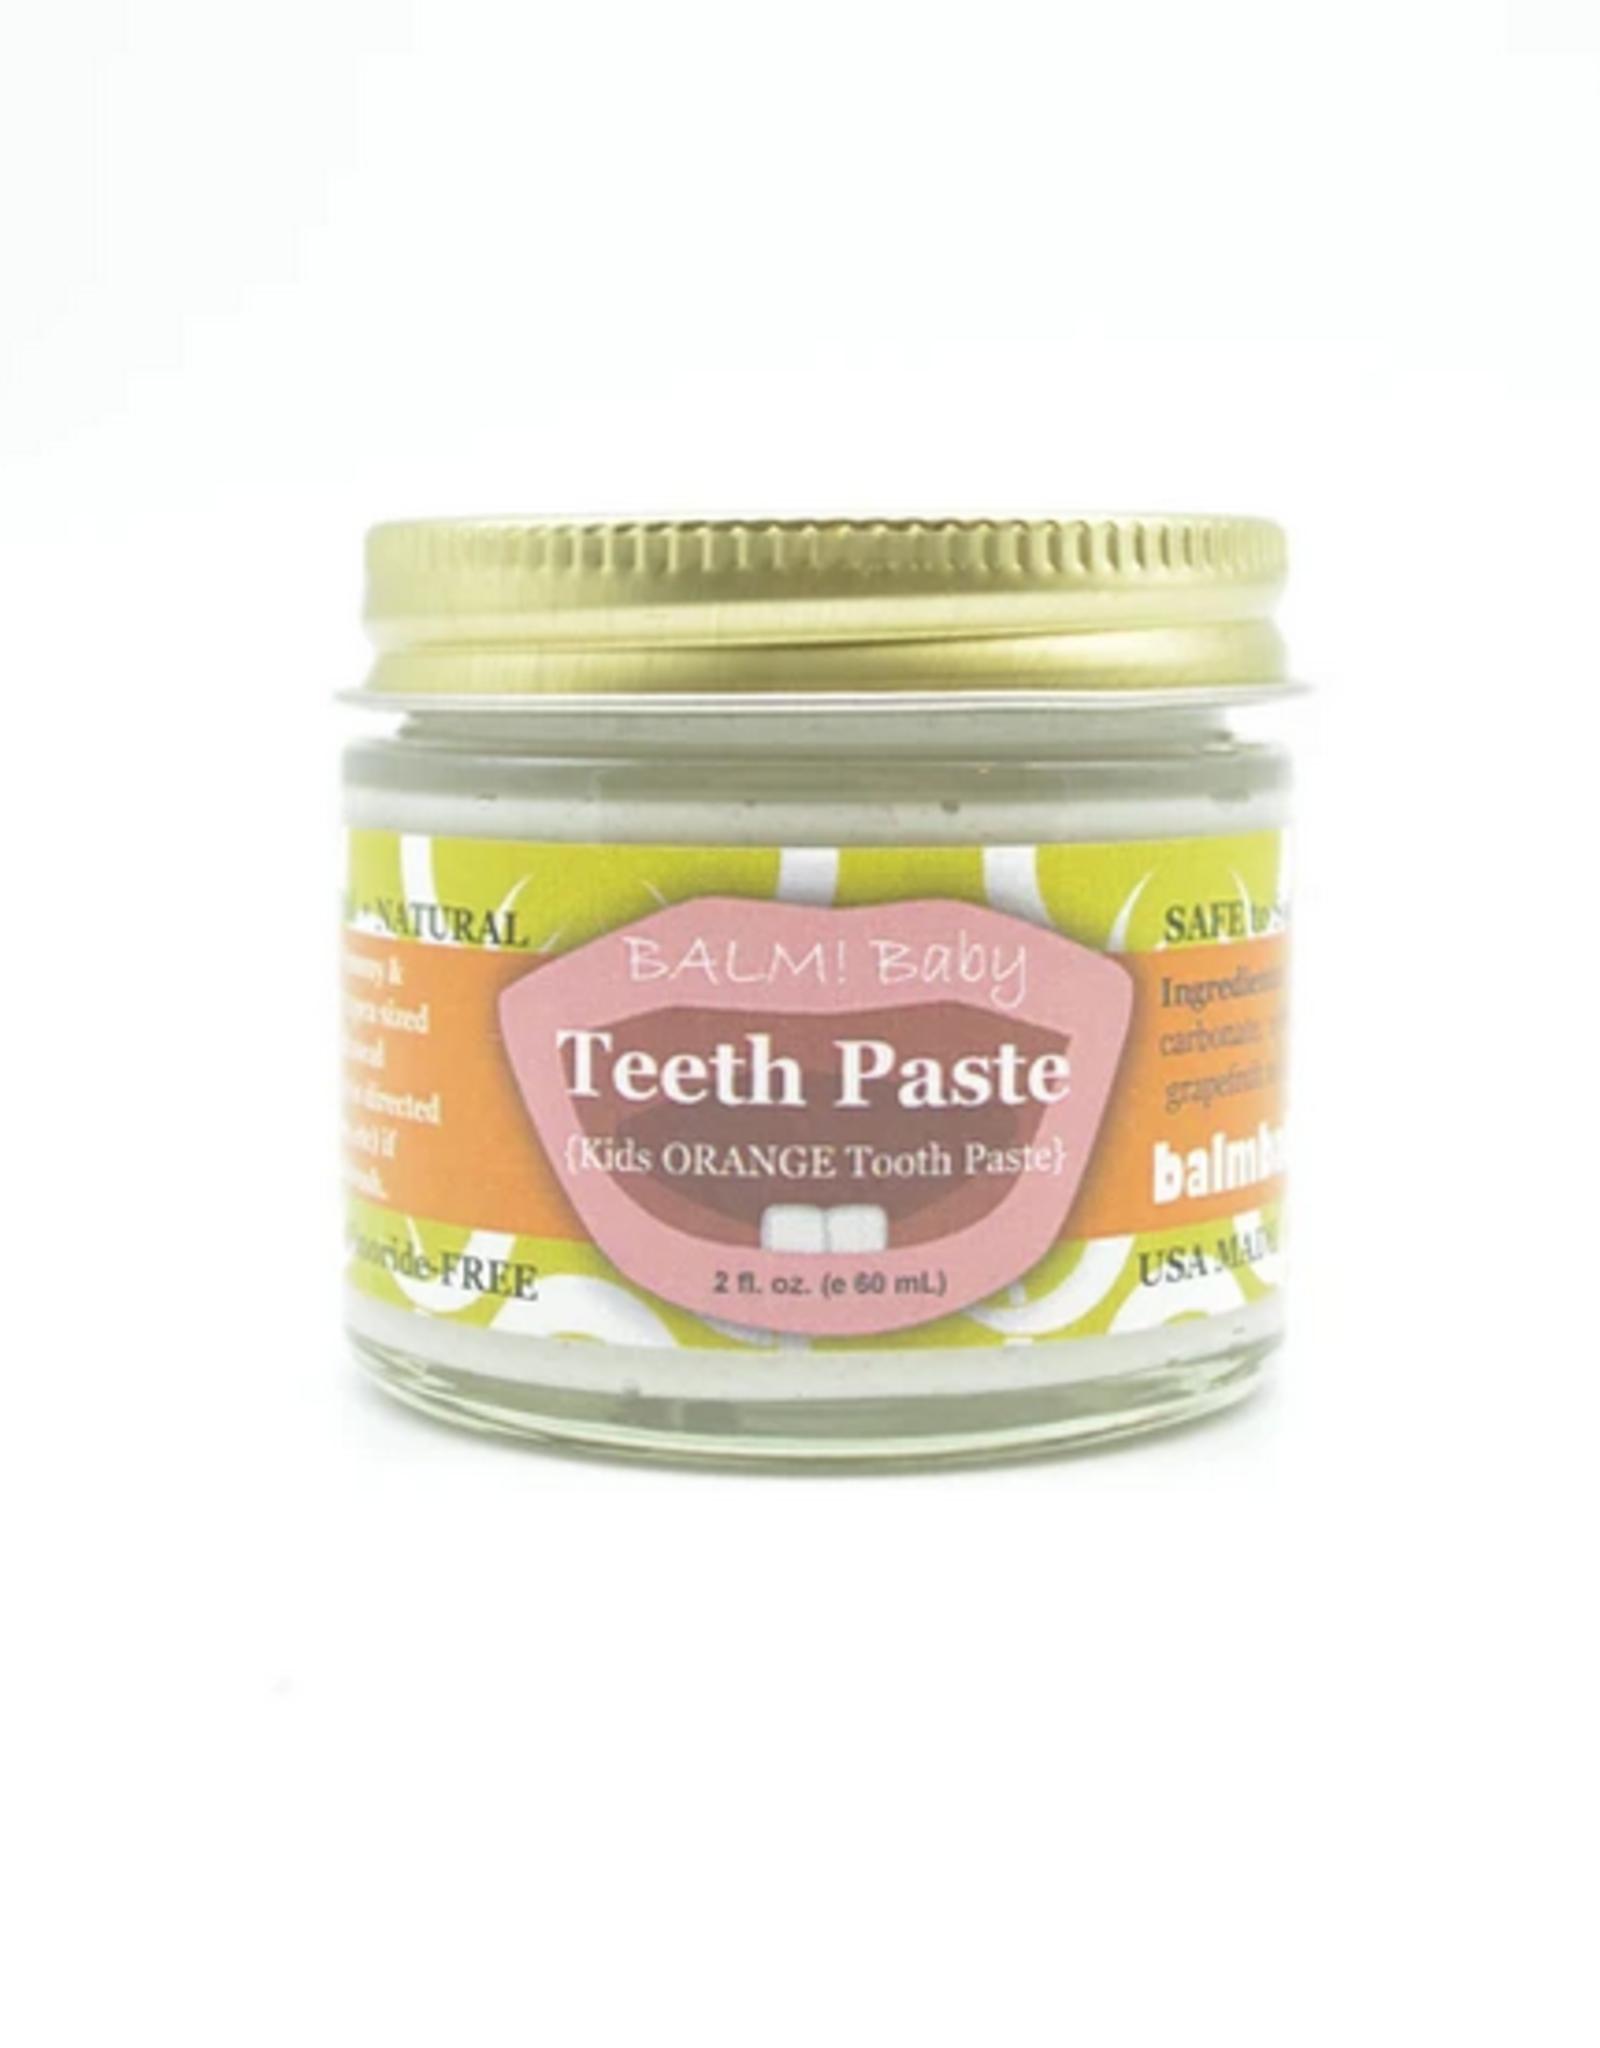 Taylor's Orange Kids' Teeth Paste